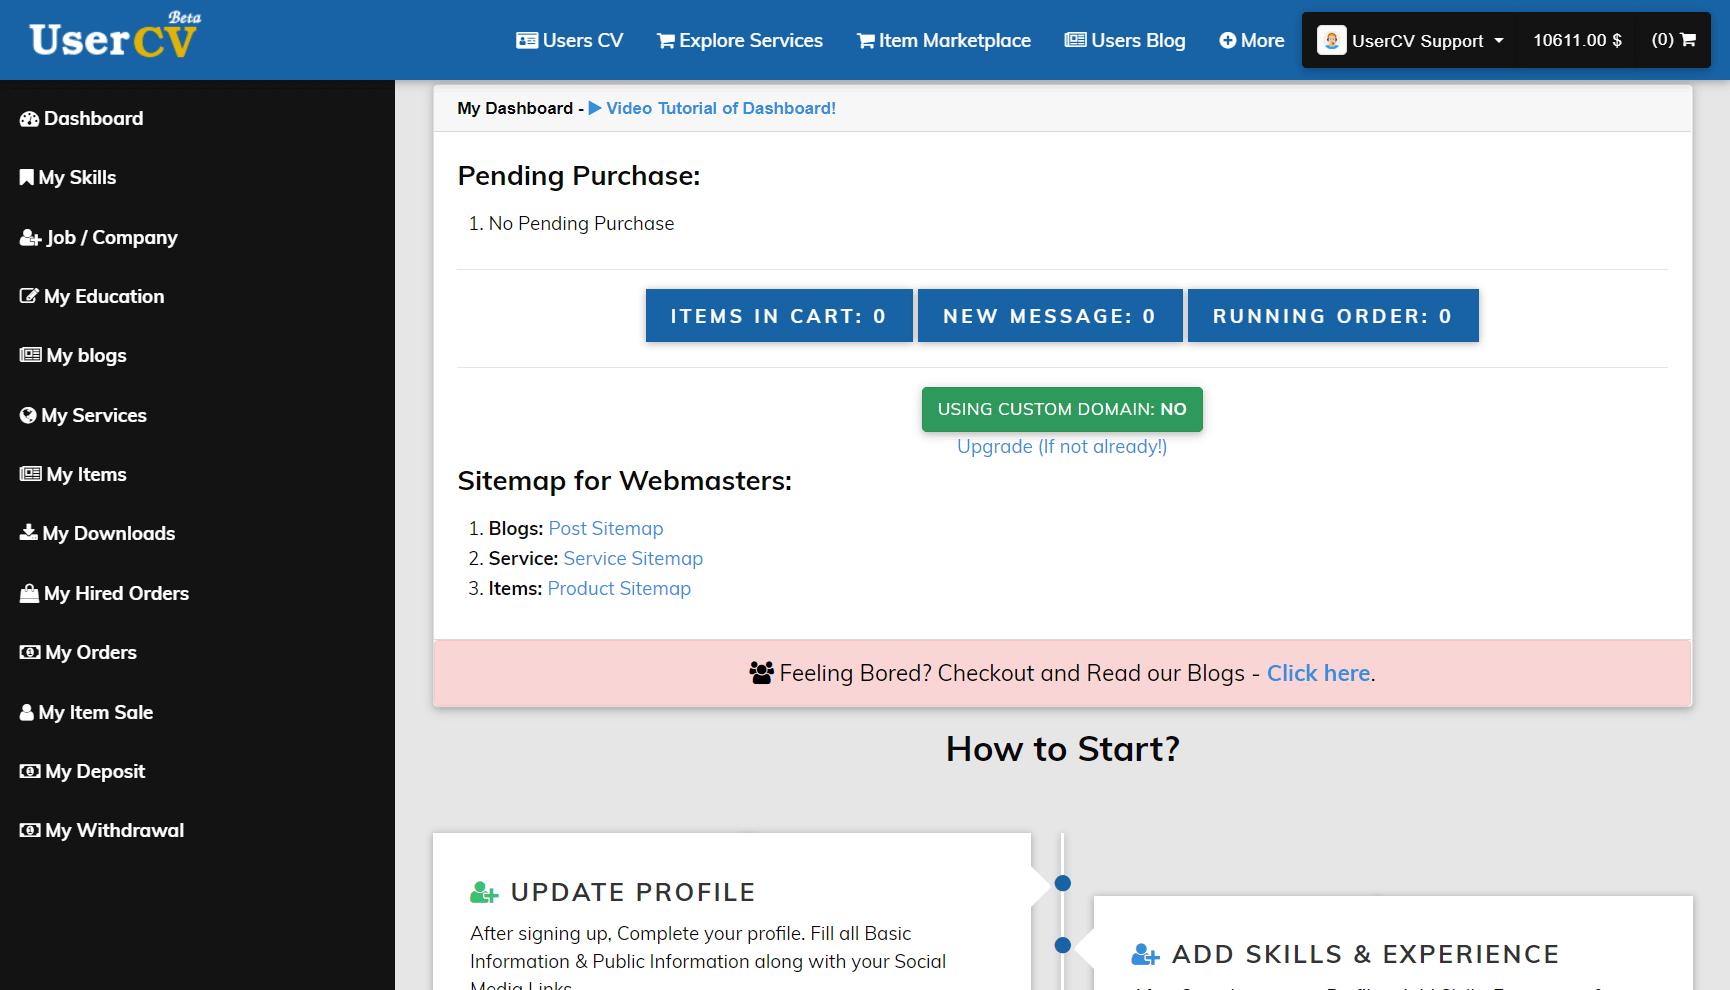 FreelancerCV - Fiverr Clone - Envato Clone - Tumblr Clone - About.me Clone (Multi Domain SAAS) - Dashboard page details